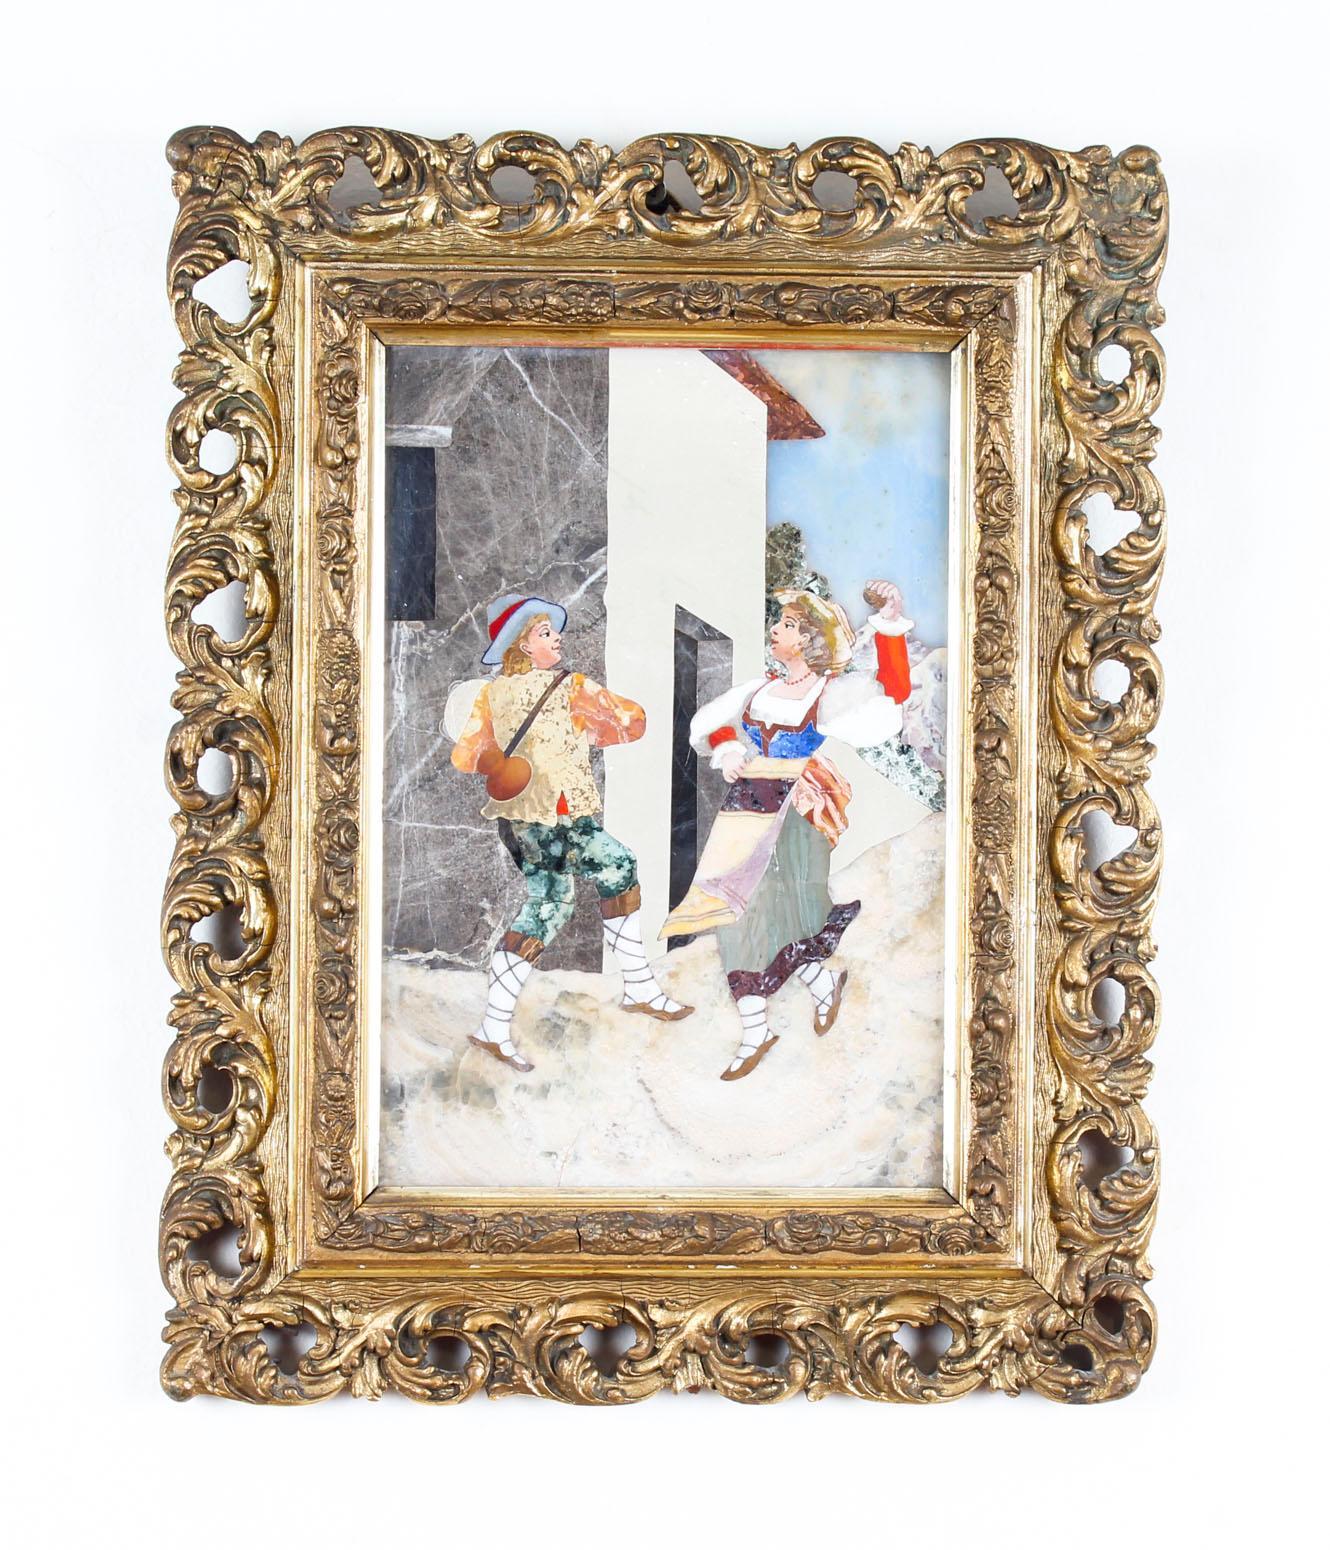 Antique Italian Grand Tour Pietra Dura Plaque Giltwood Frame, 19th Century